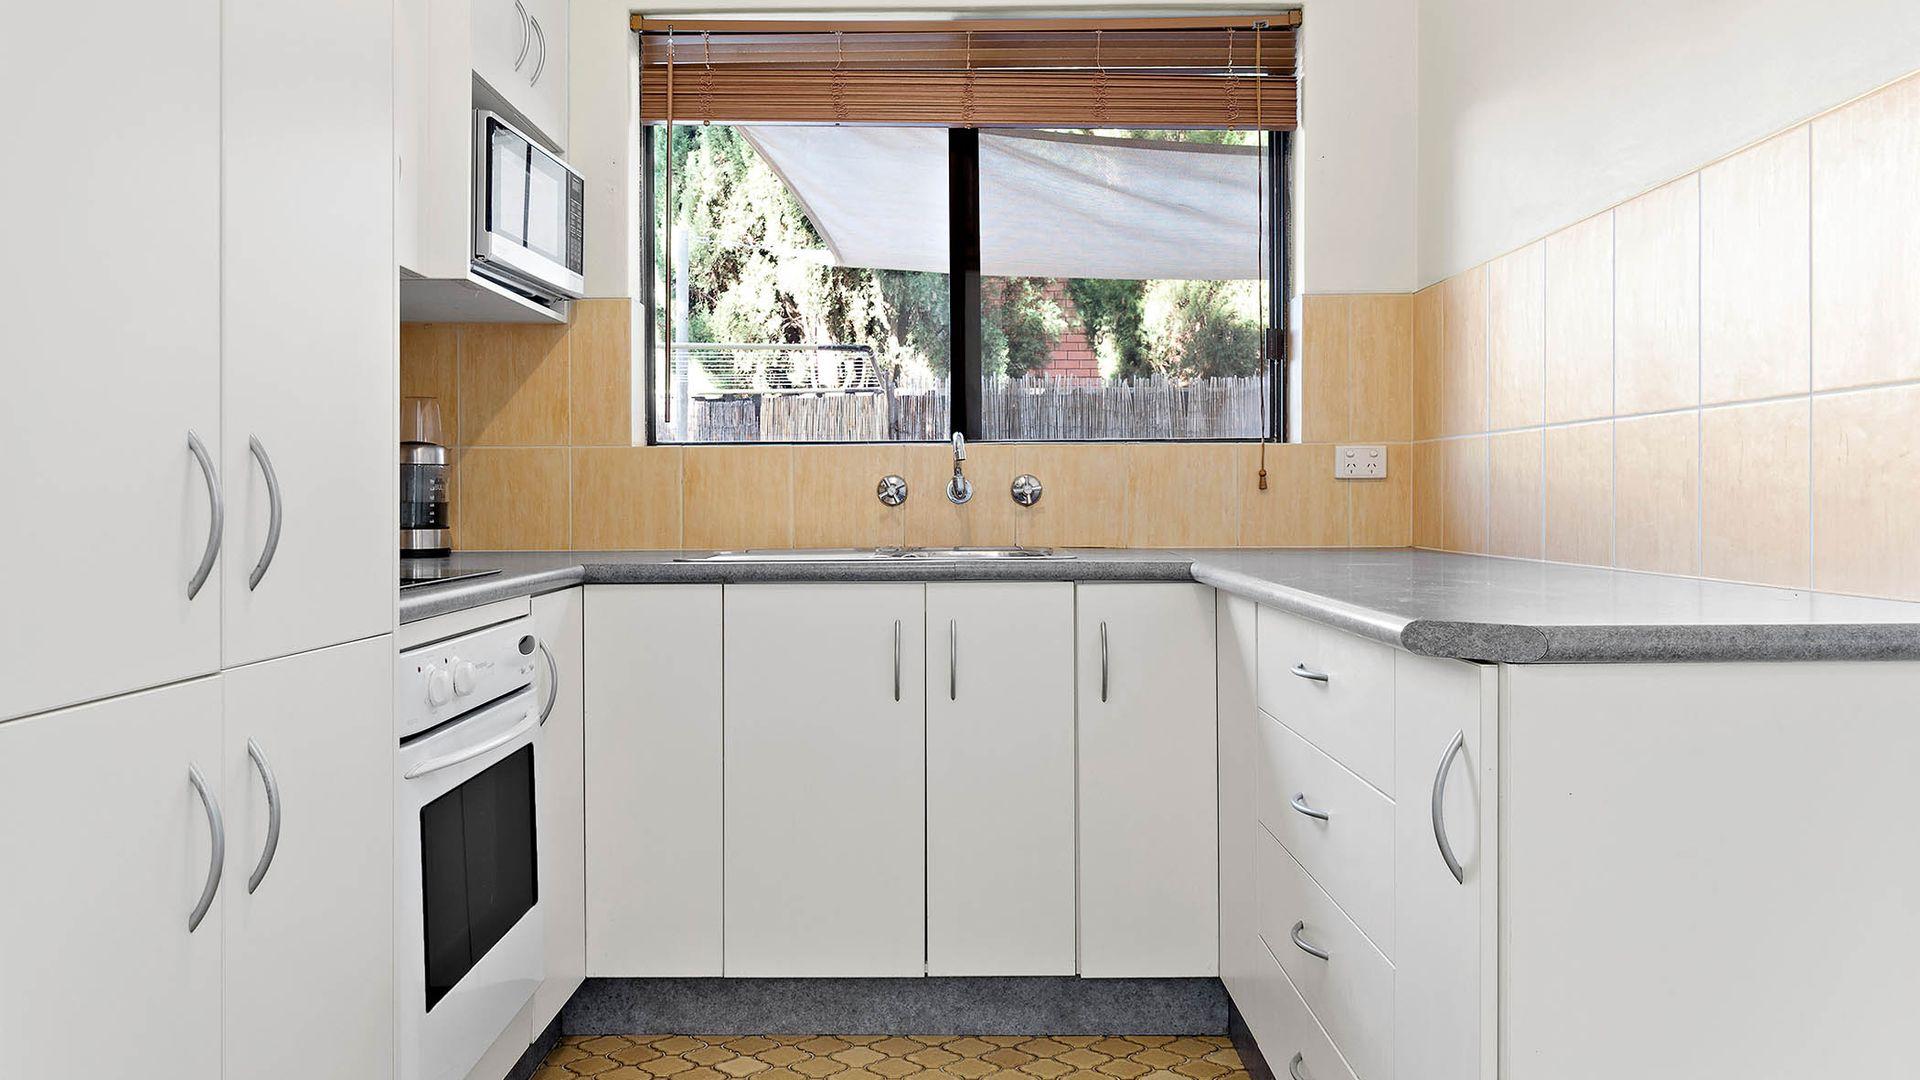 1/68 Putland Street, St Marys NSW 2760 - Apartment For Sale | Domain